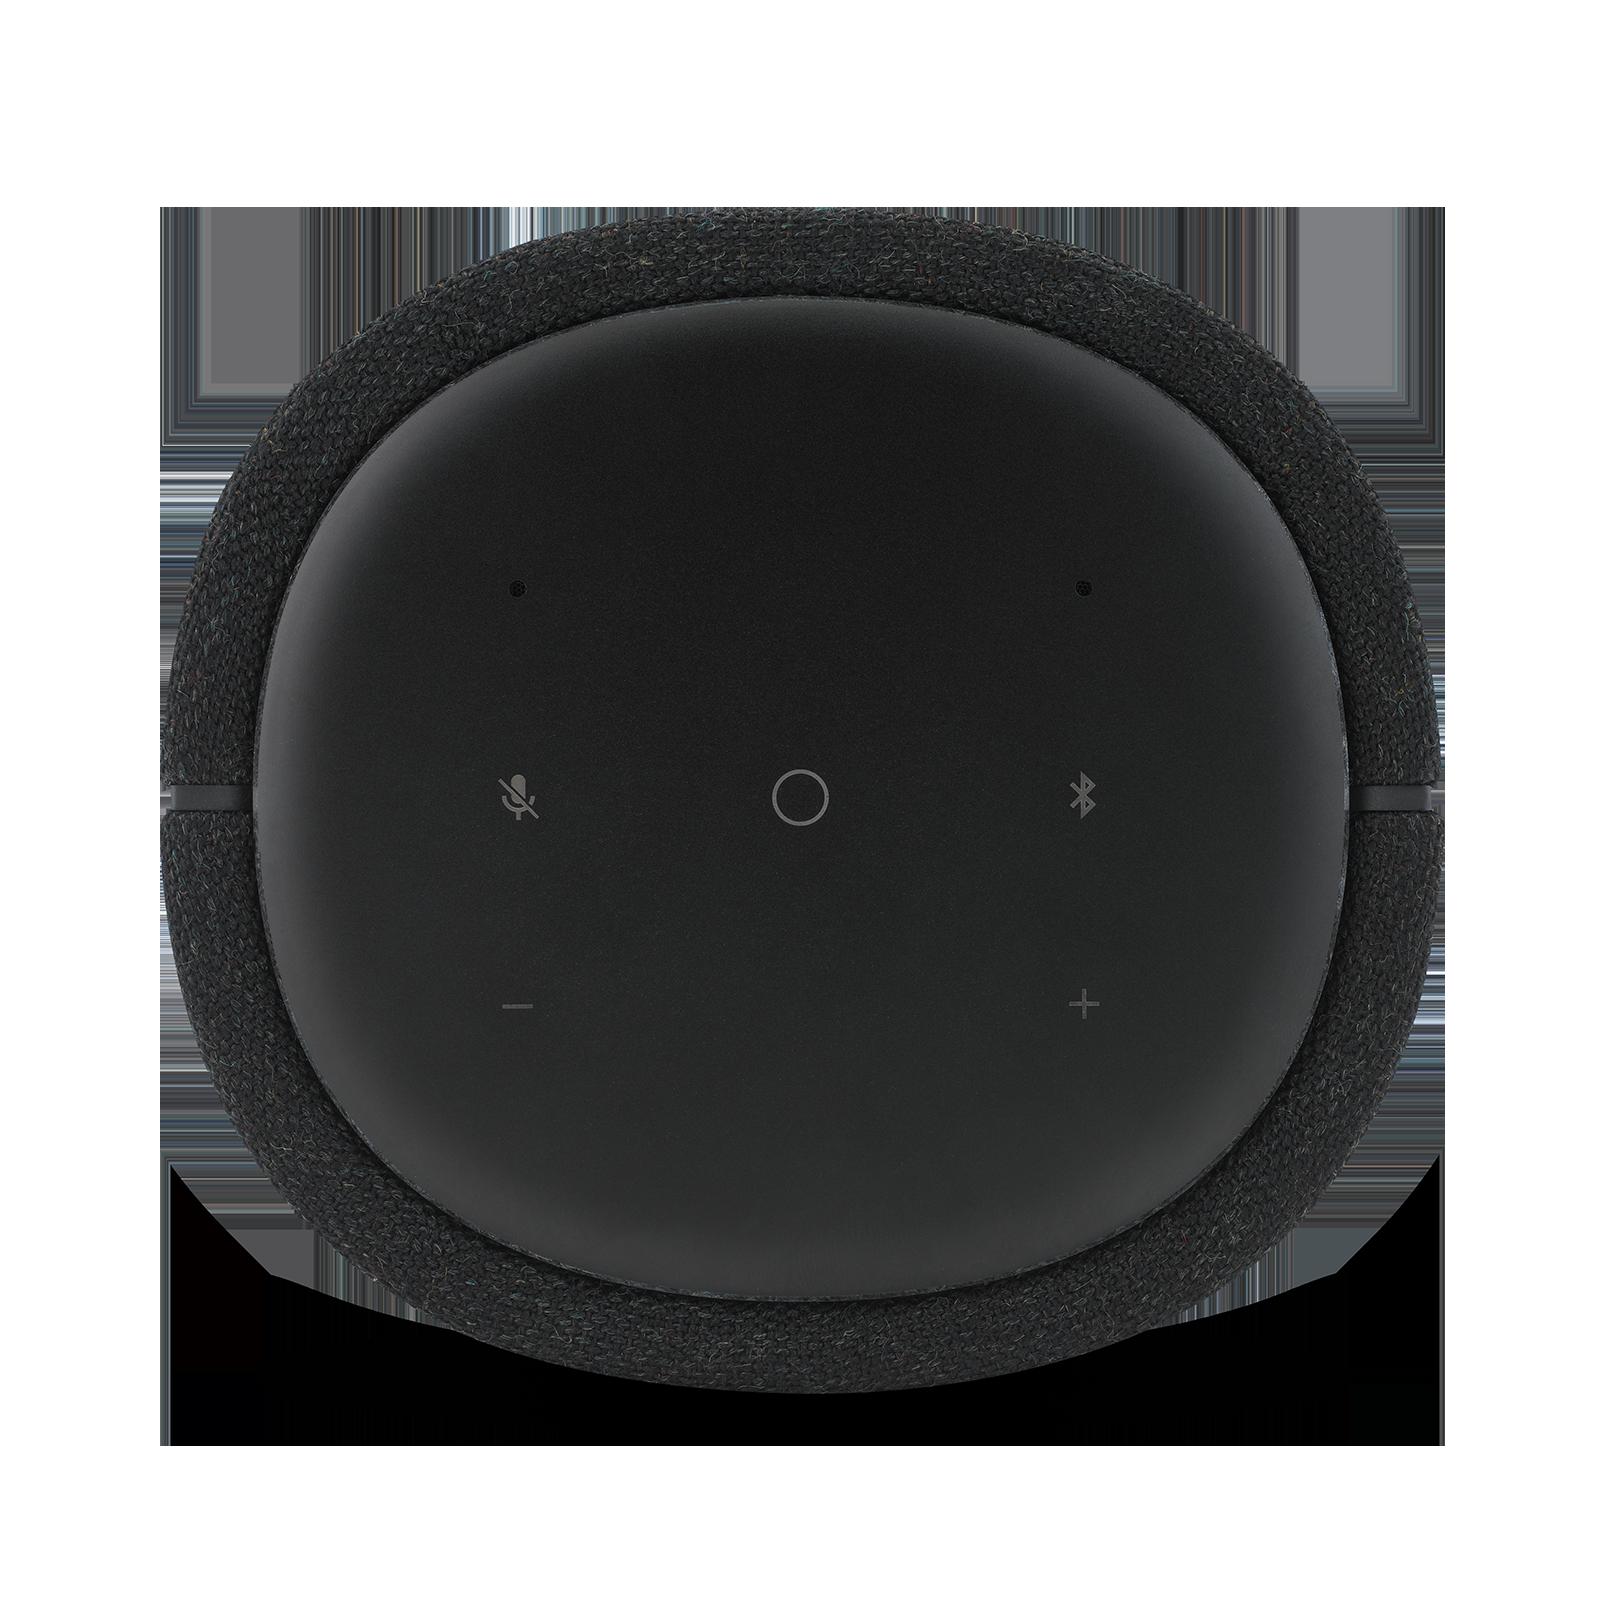 Harman Kardon Citation 100 - Black - The smallest, smartest home speaker with impactful sound - Detailshot 2